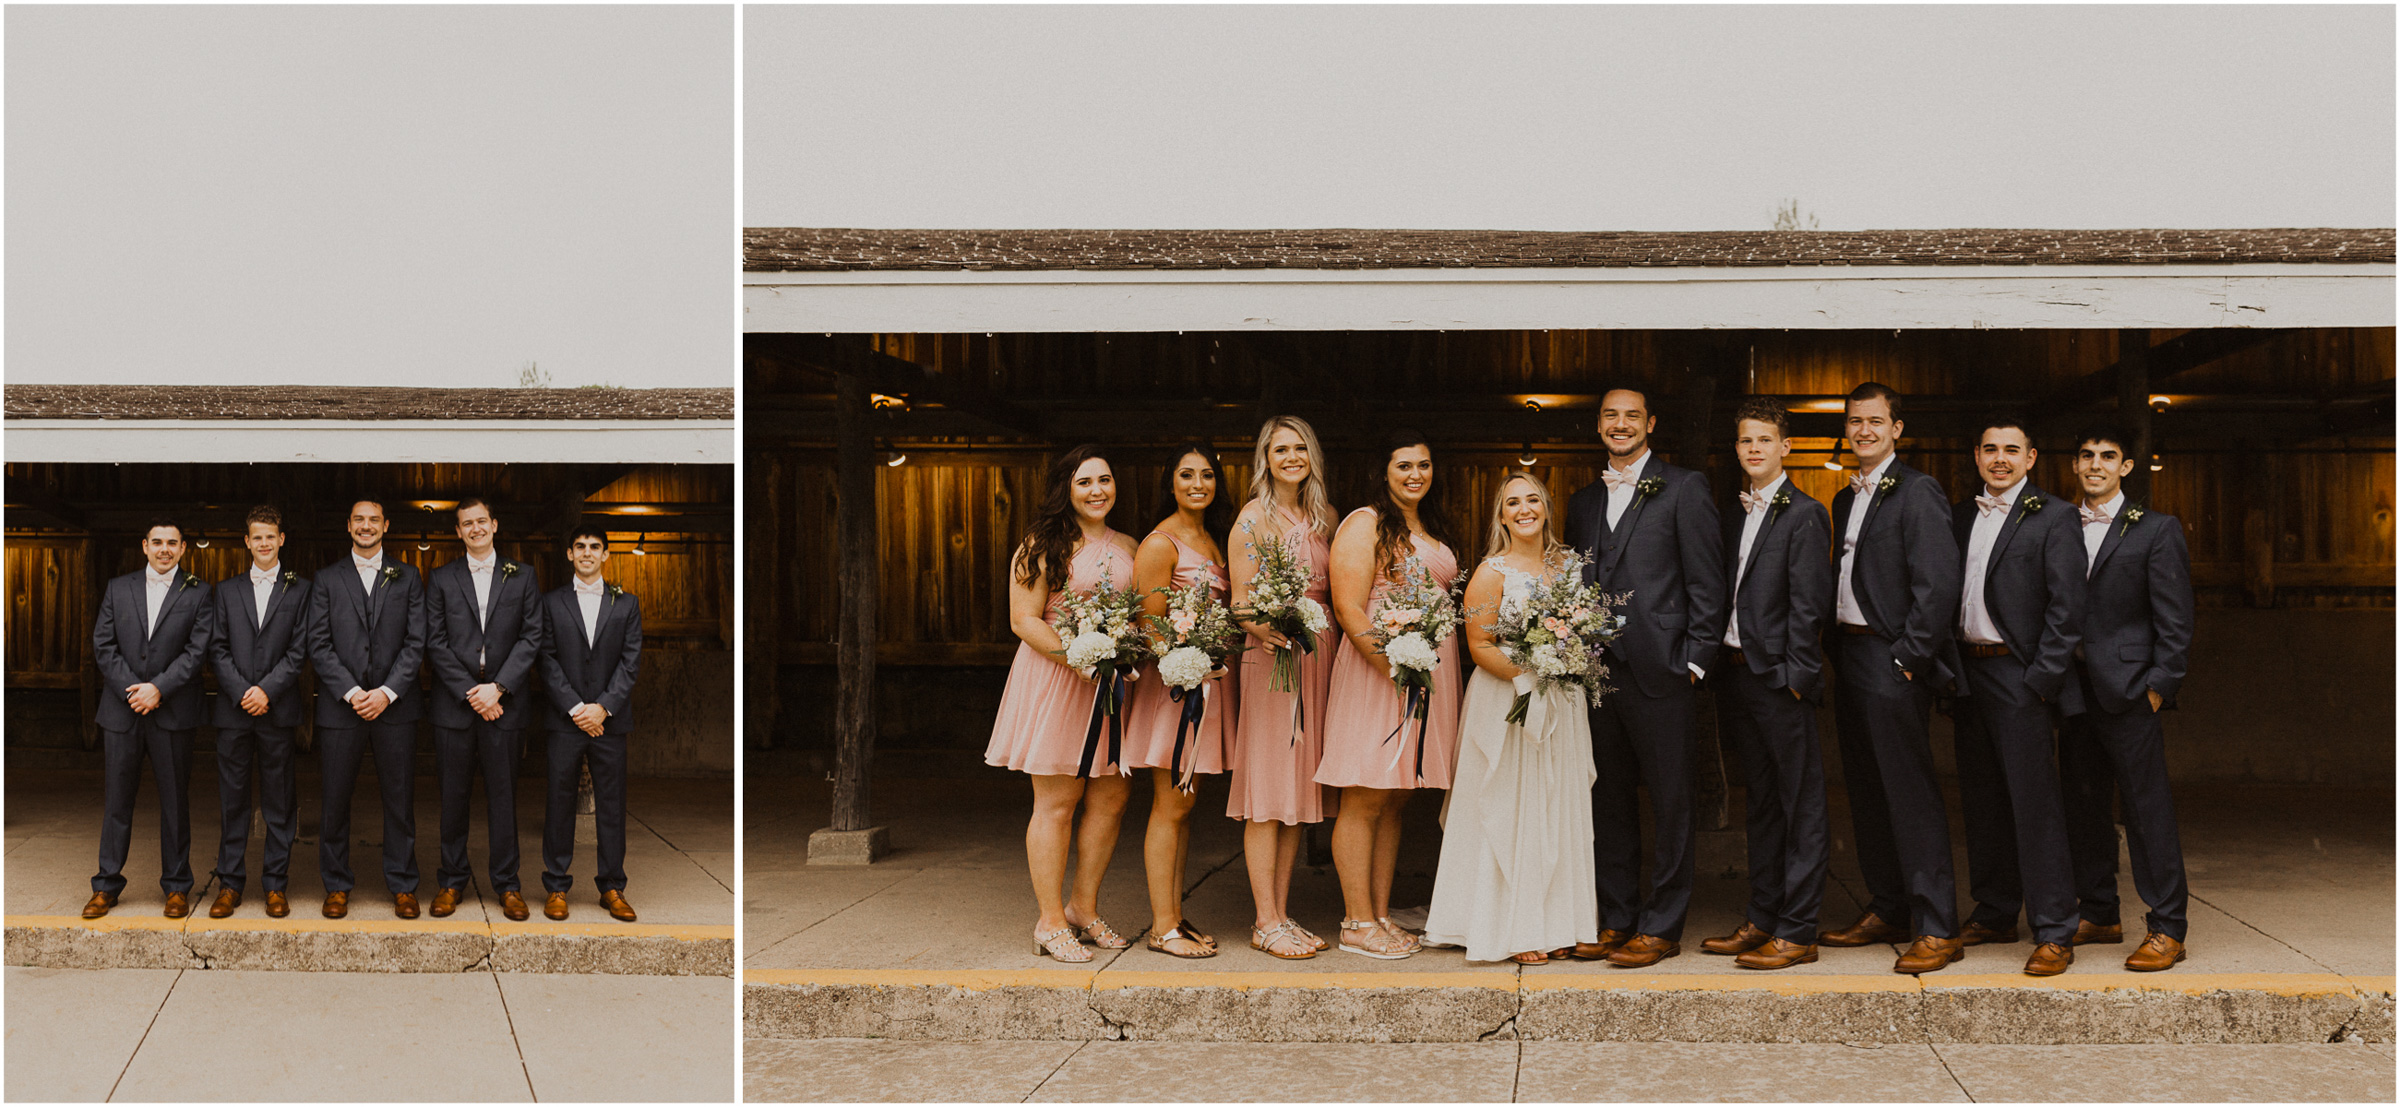 alyssa barletter photography nelson wedding nebraska city lied lodge morton barn spring wedding photographer-23.jpg